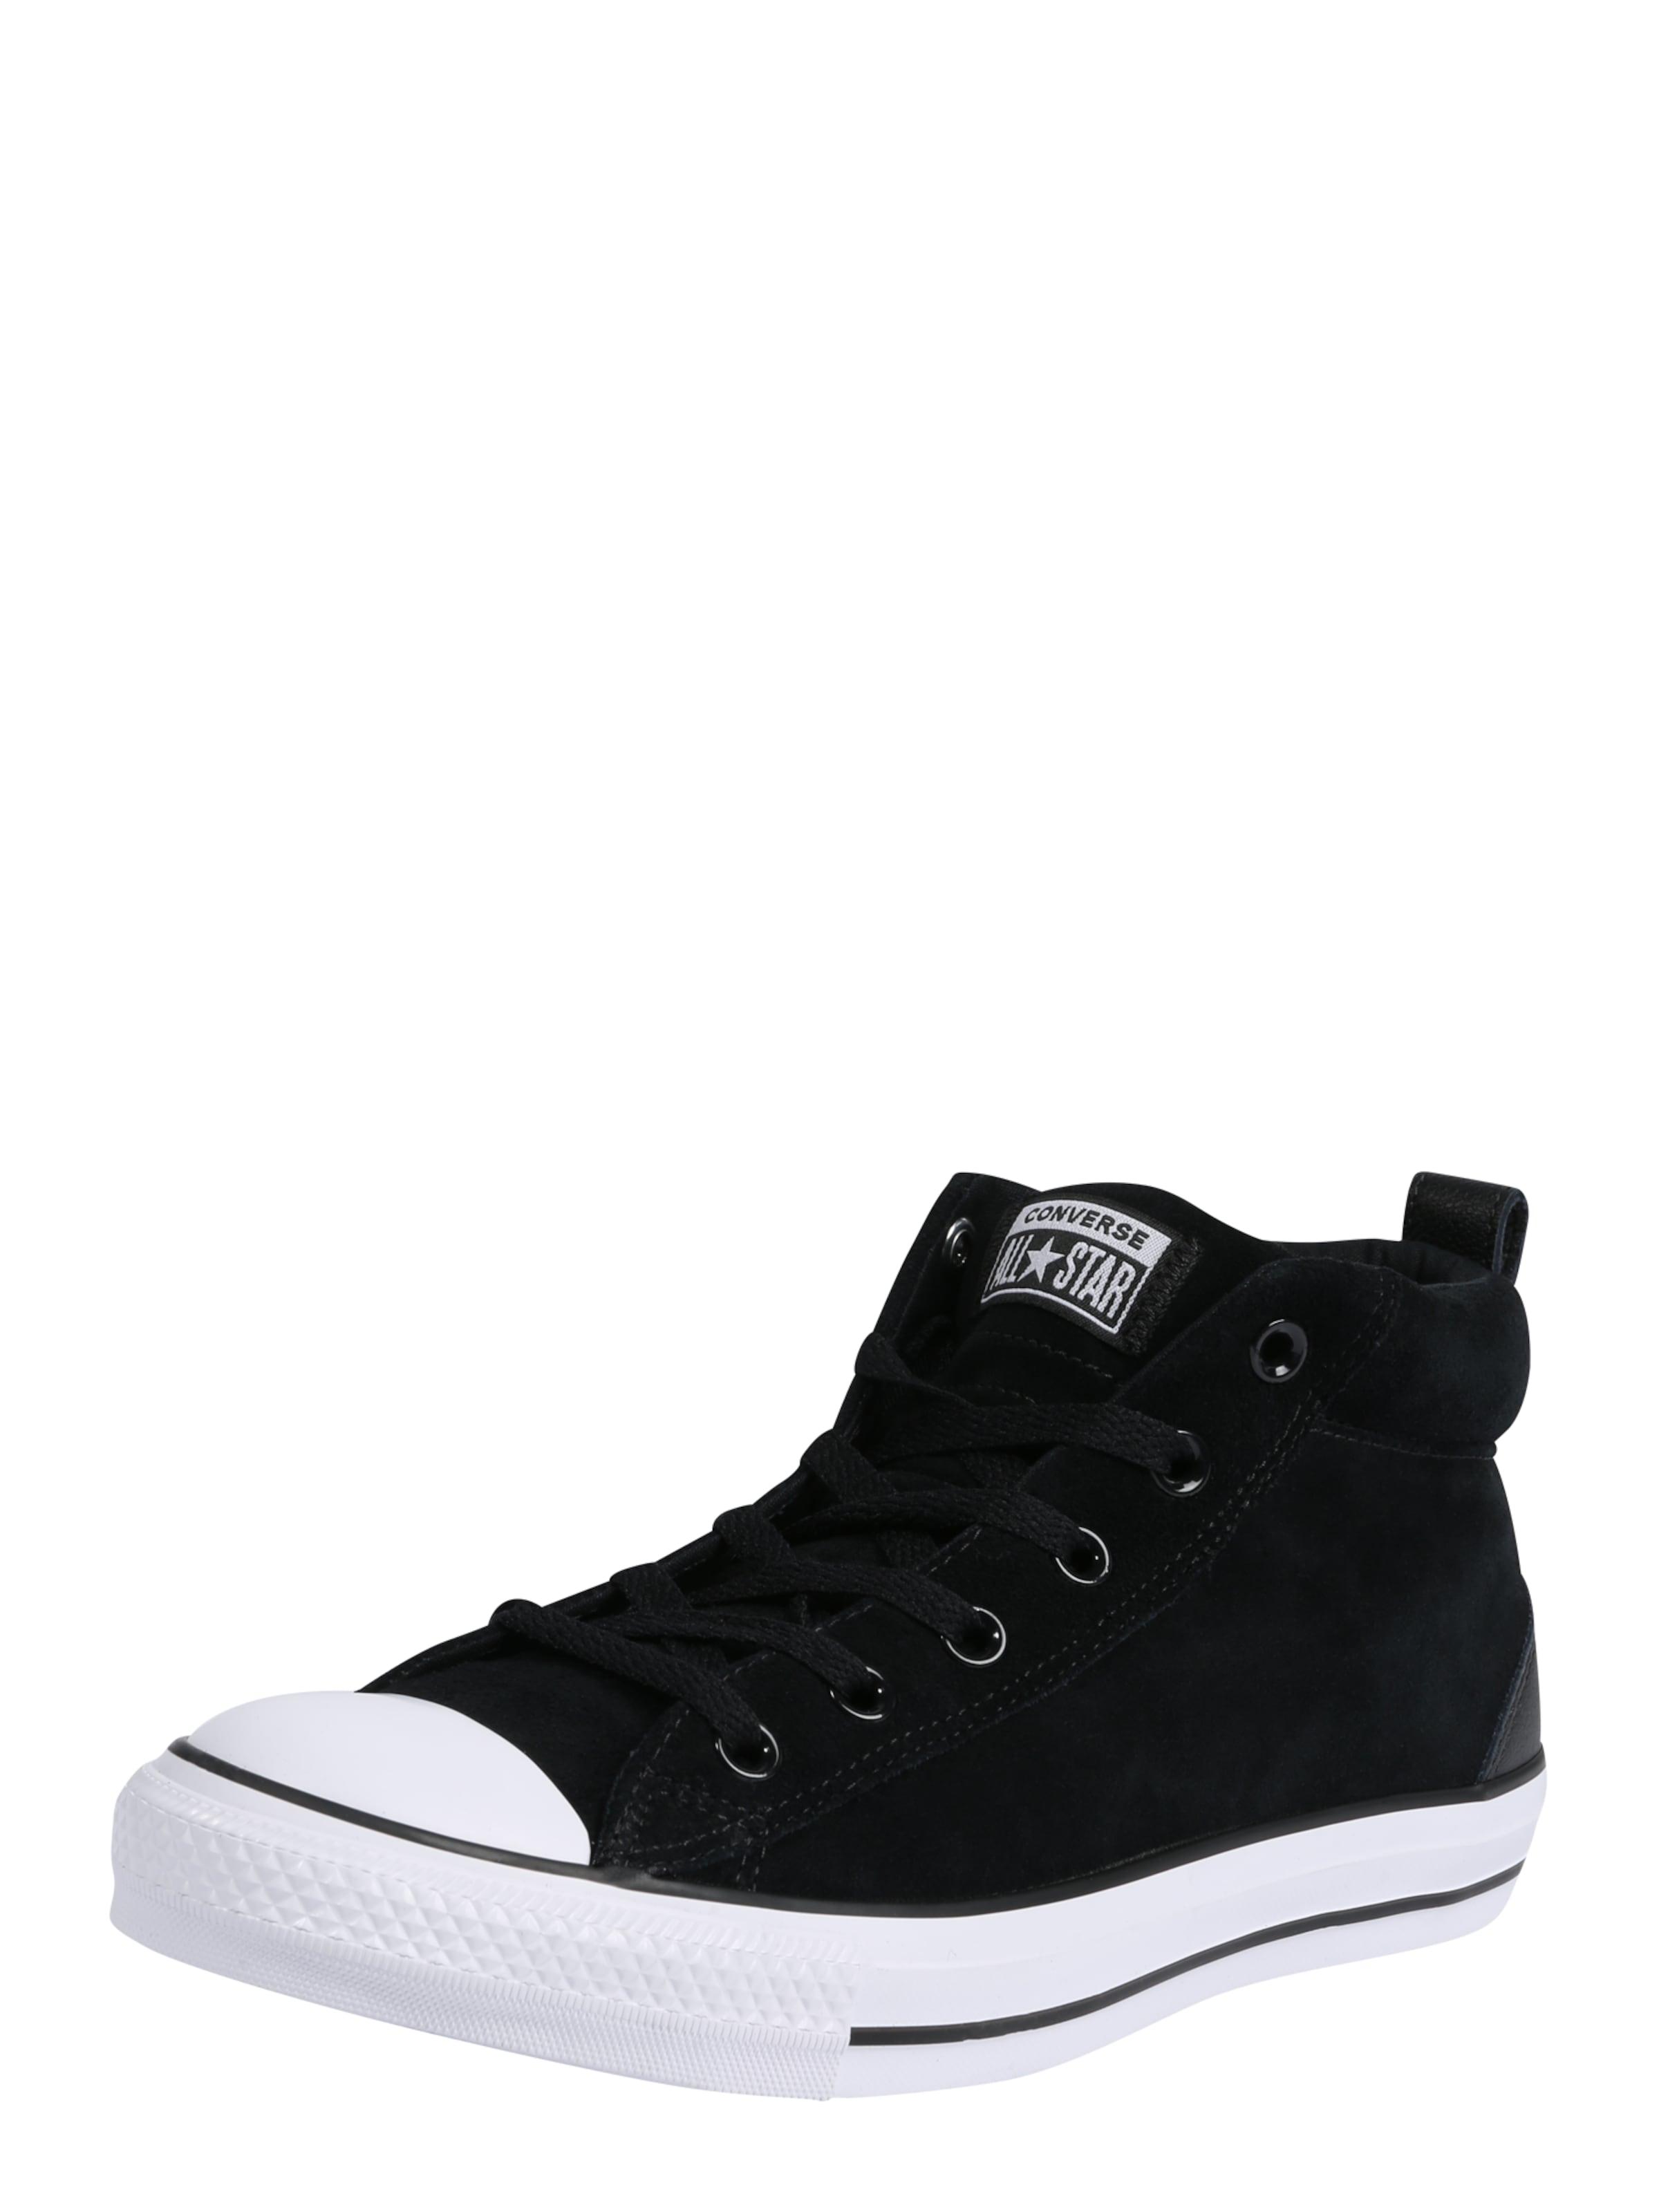 CONVERSE Sneaker CHUCK TAYLOR ALL STAR STREET - MID